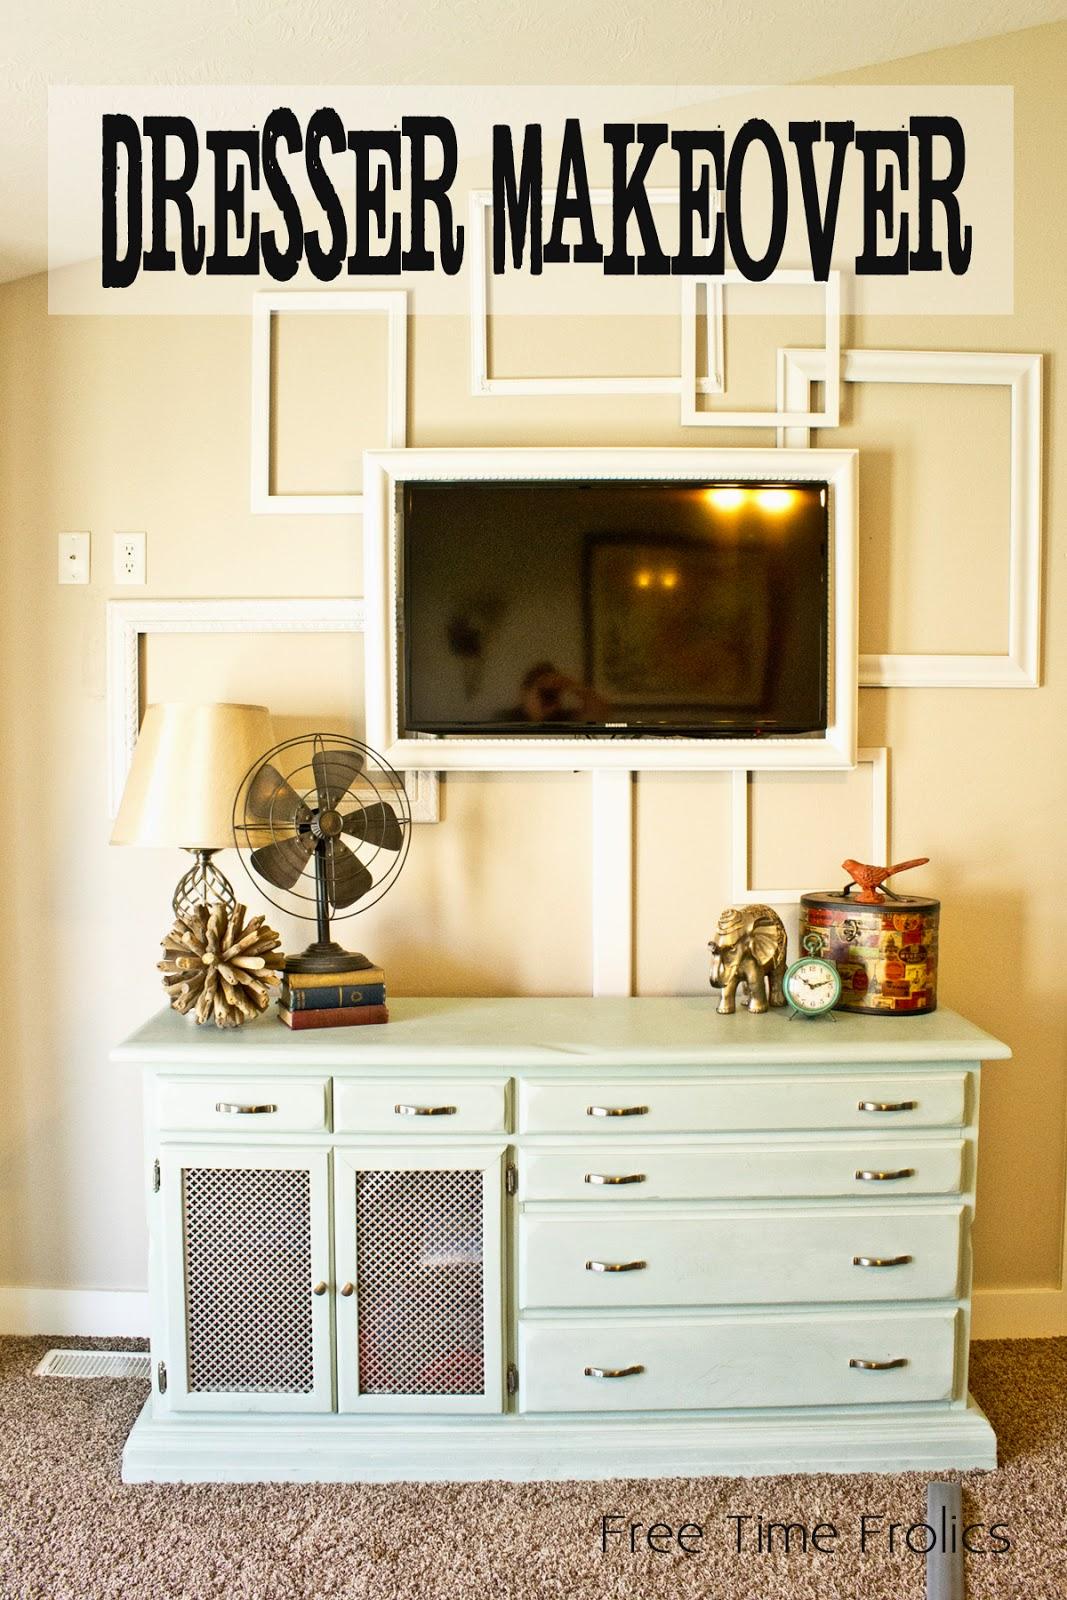 Dresser makeover with Annie Sloan paint www.freetimefrolics.om